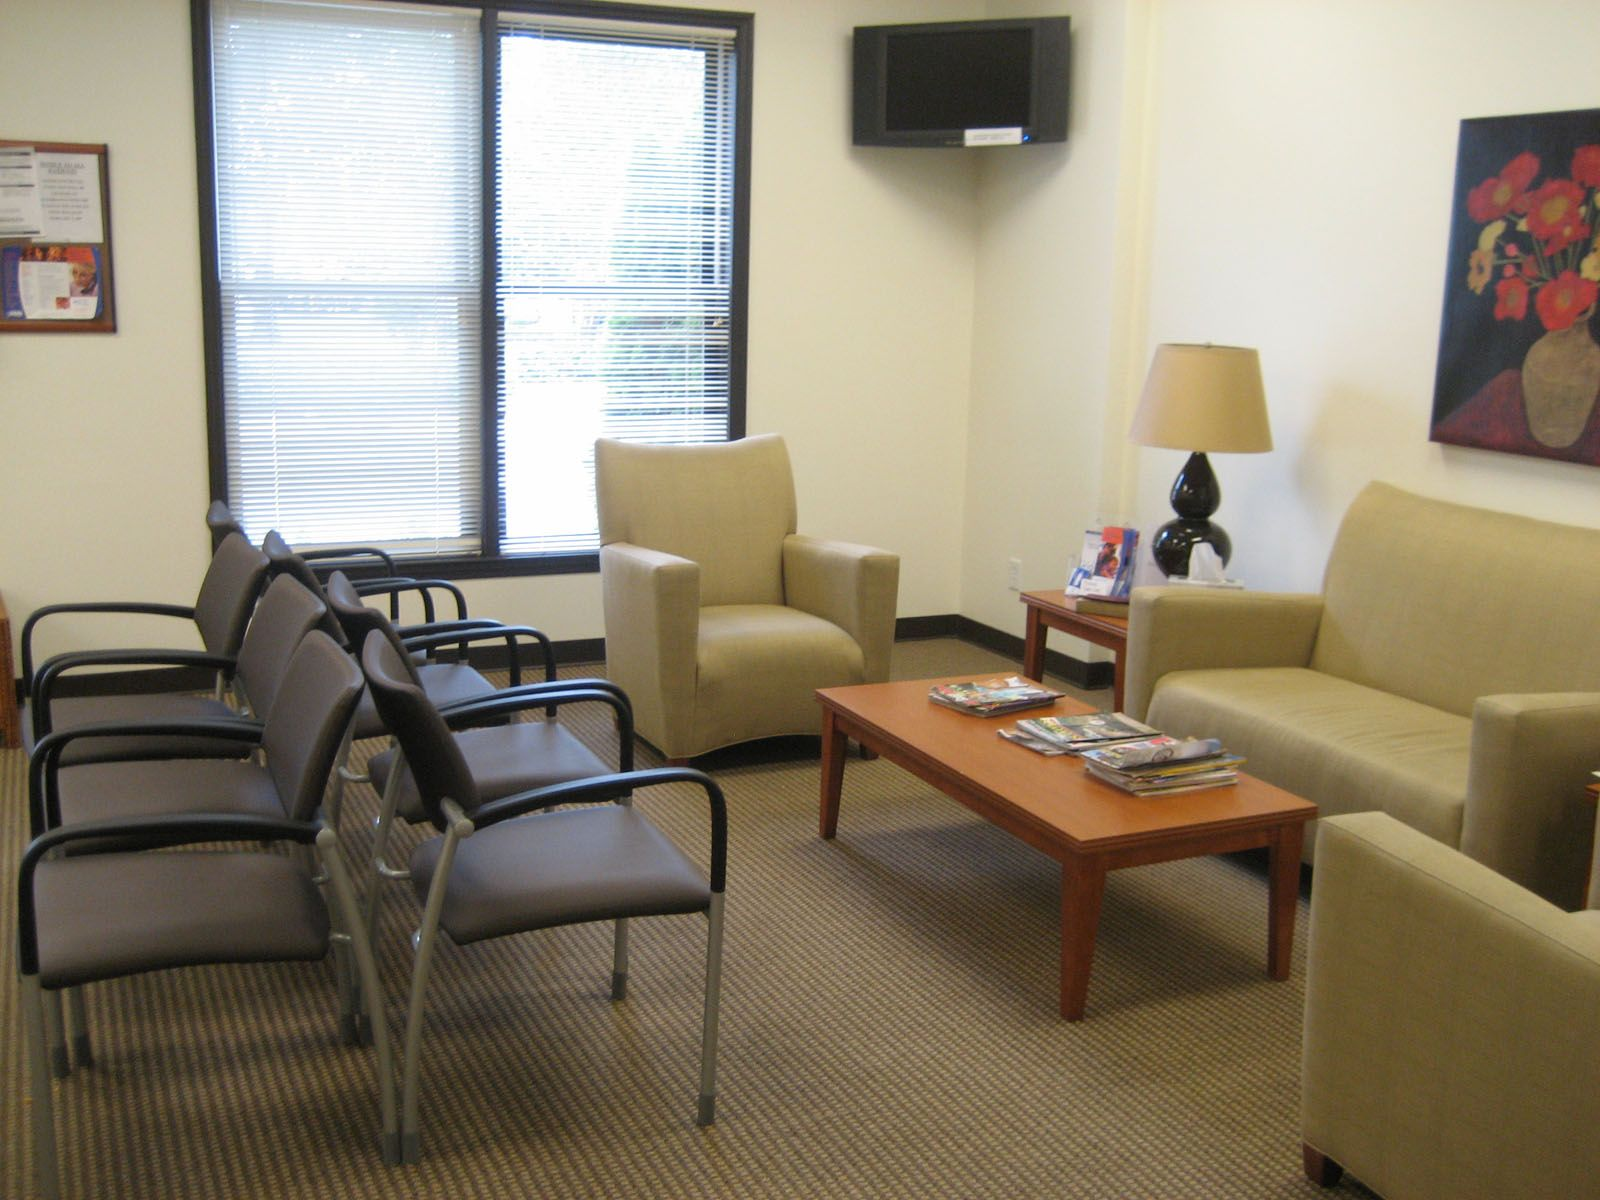 trending post now modern office waiting room ideas 2 waiting room rh pinterest com